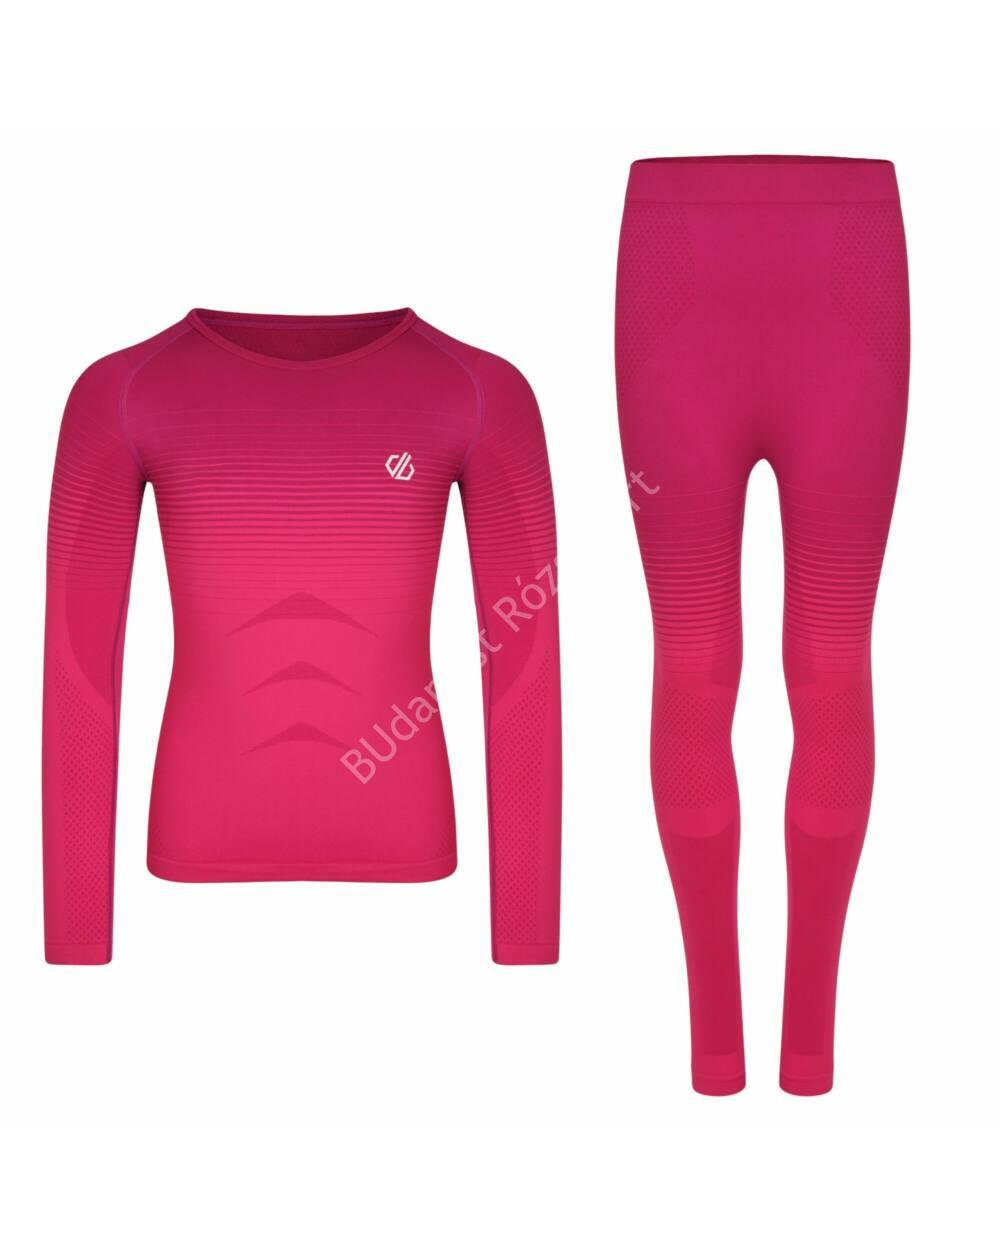 Dare2b In the Zone gyerek aláöltözet szett, cyber pink, 128-140 cm